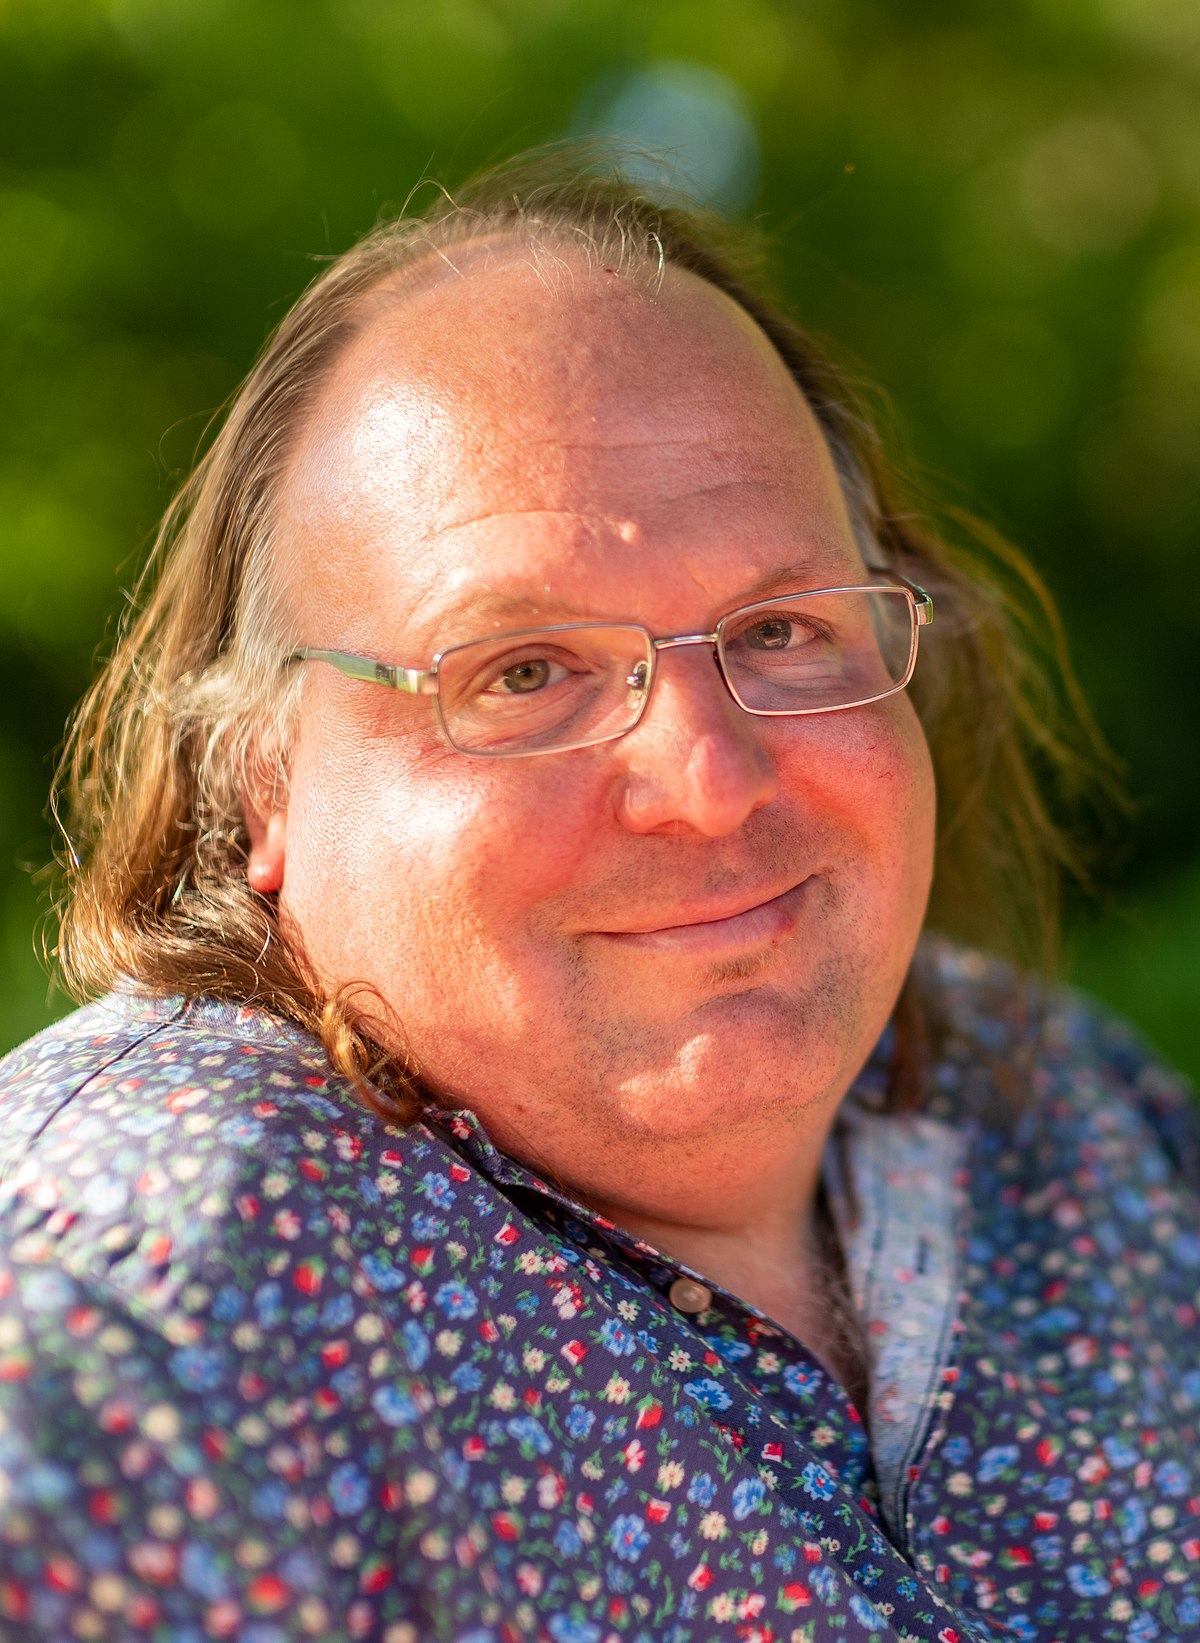 Ethan Zuckerman - Wikipedia, la enciclopedia libre